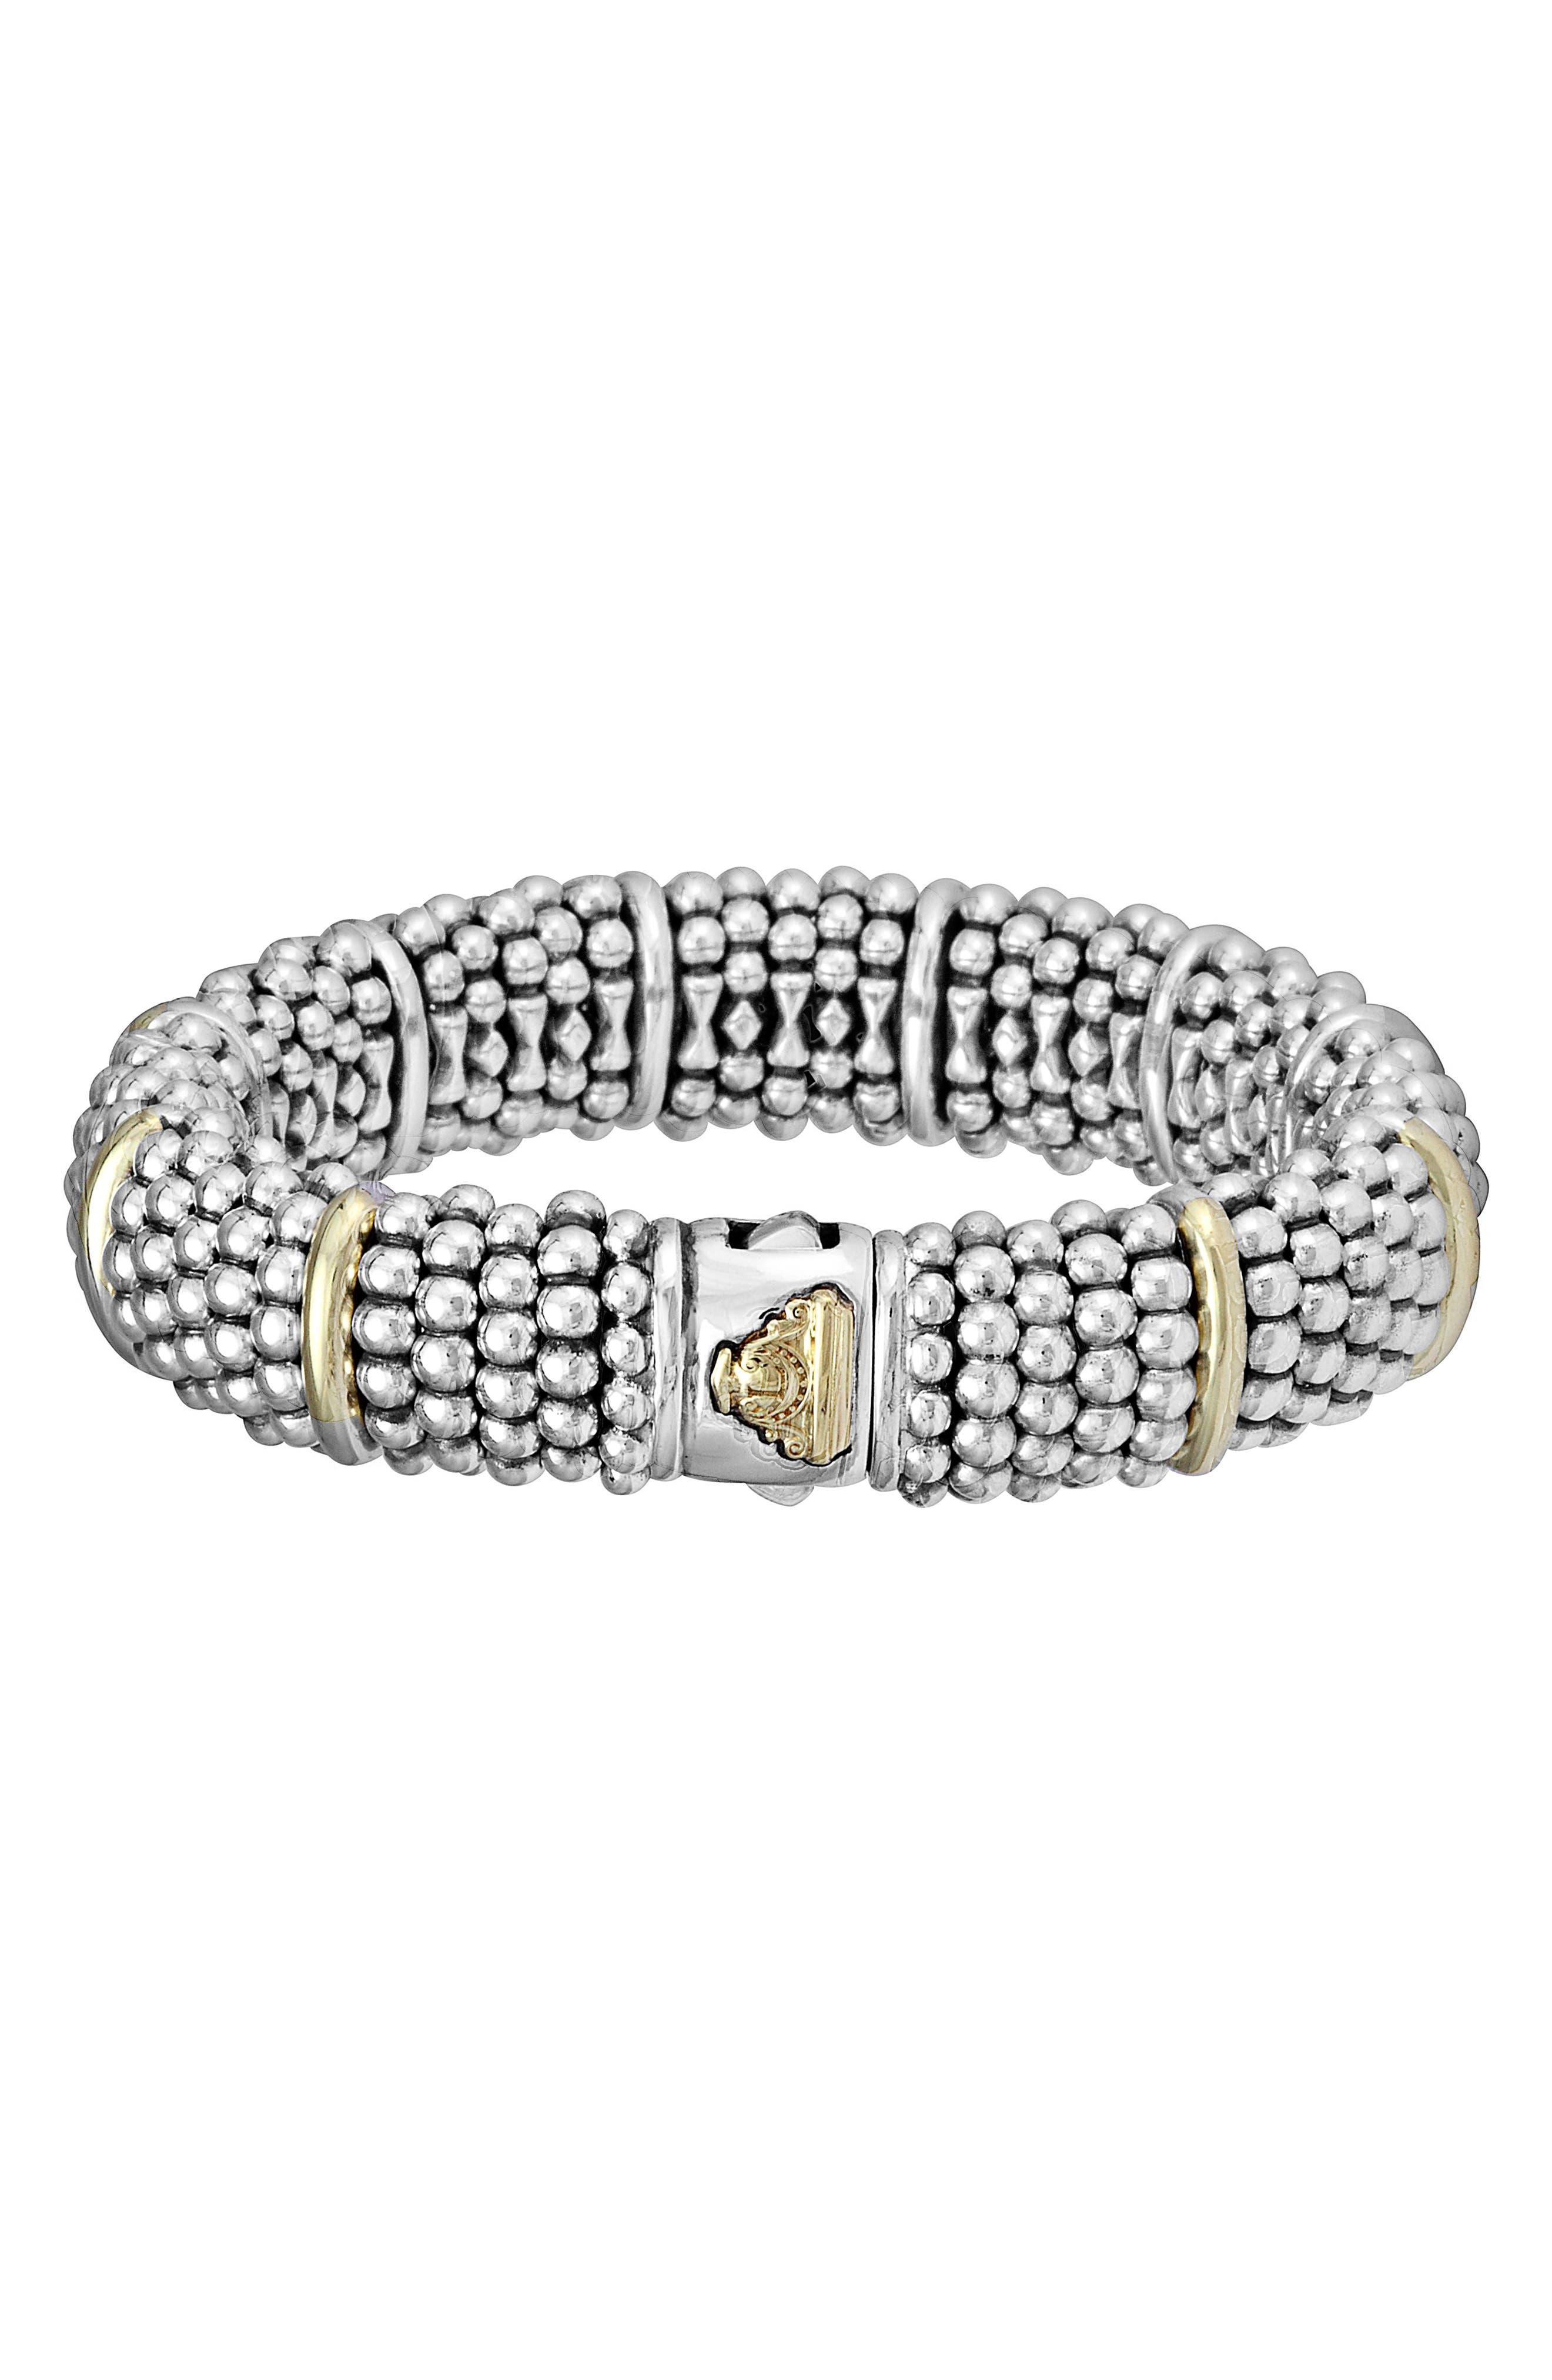 Oval Caviar Bracelet,                             Alternate thumbnail 4, color,                             Silver/ Gold